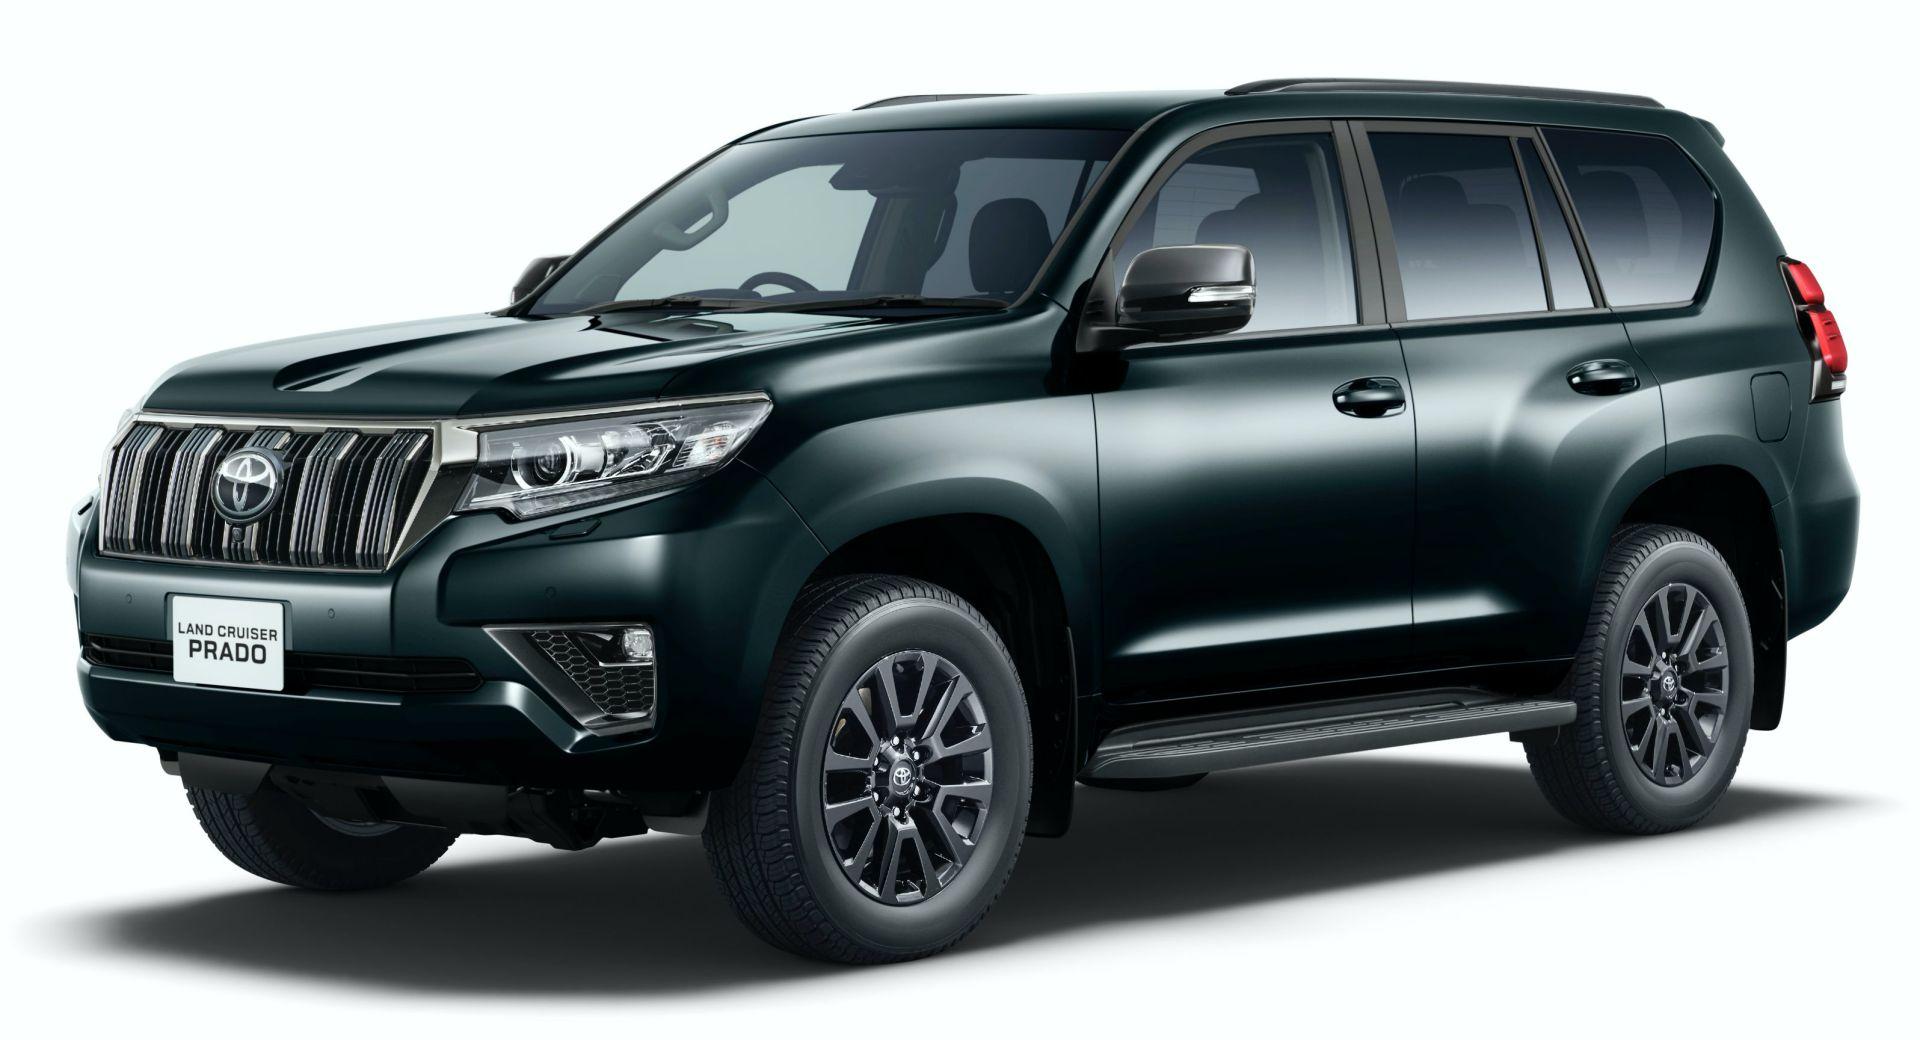 2020 Toyota Prado Release Date and Concept